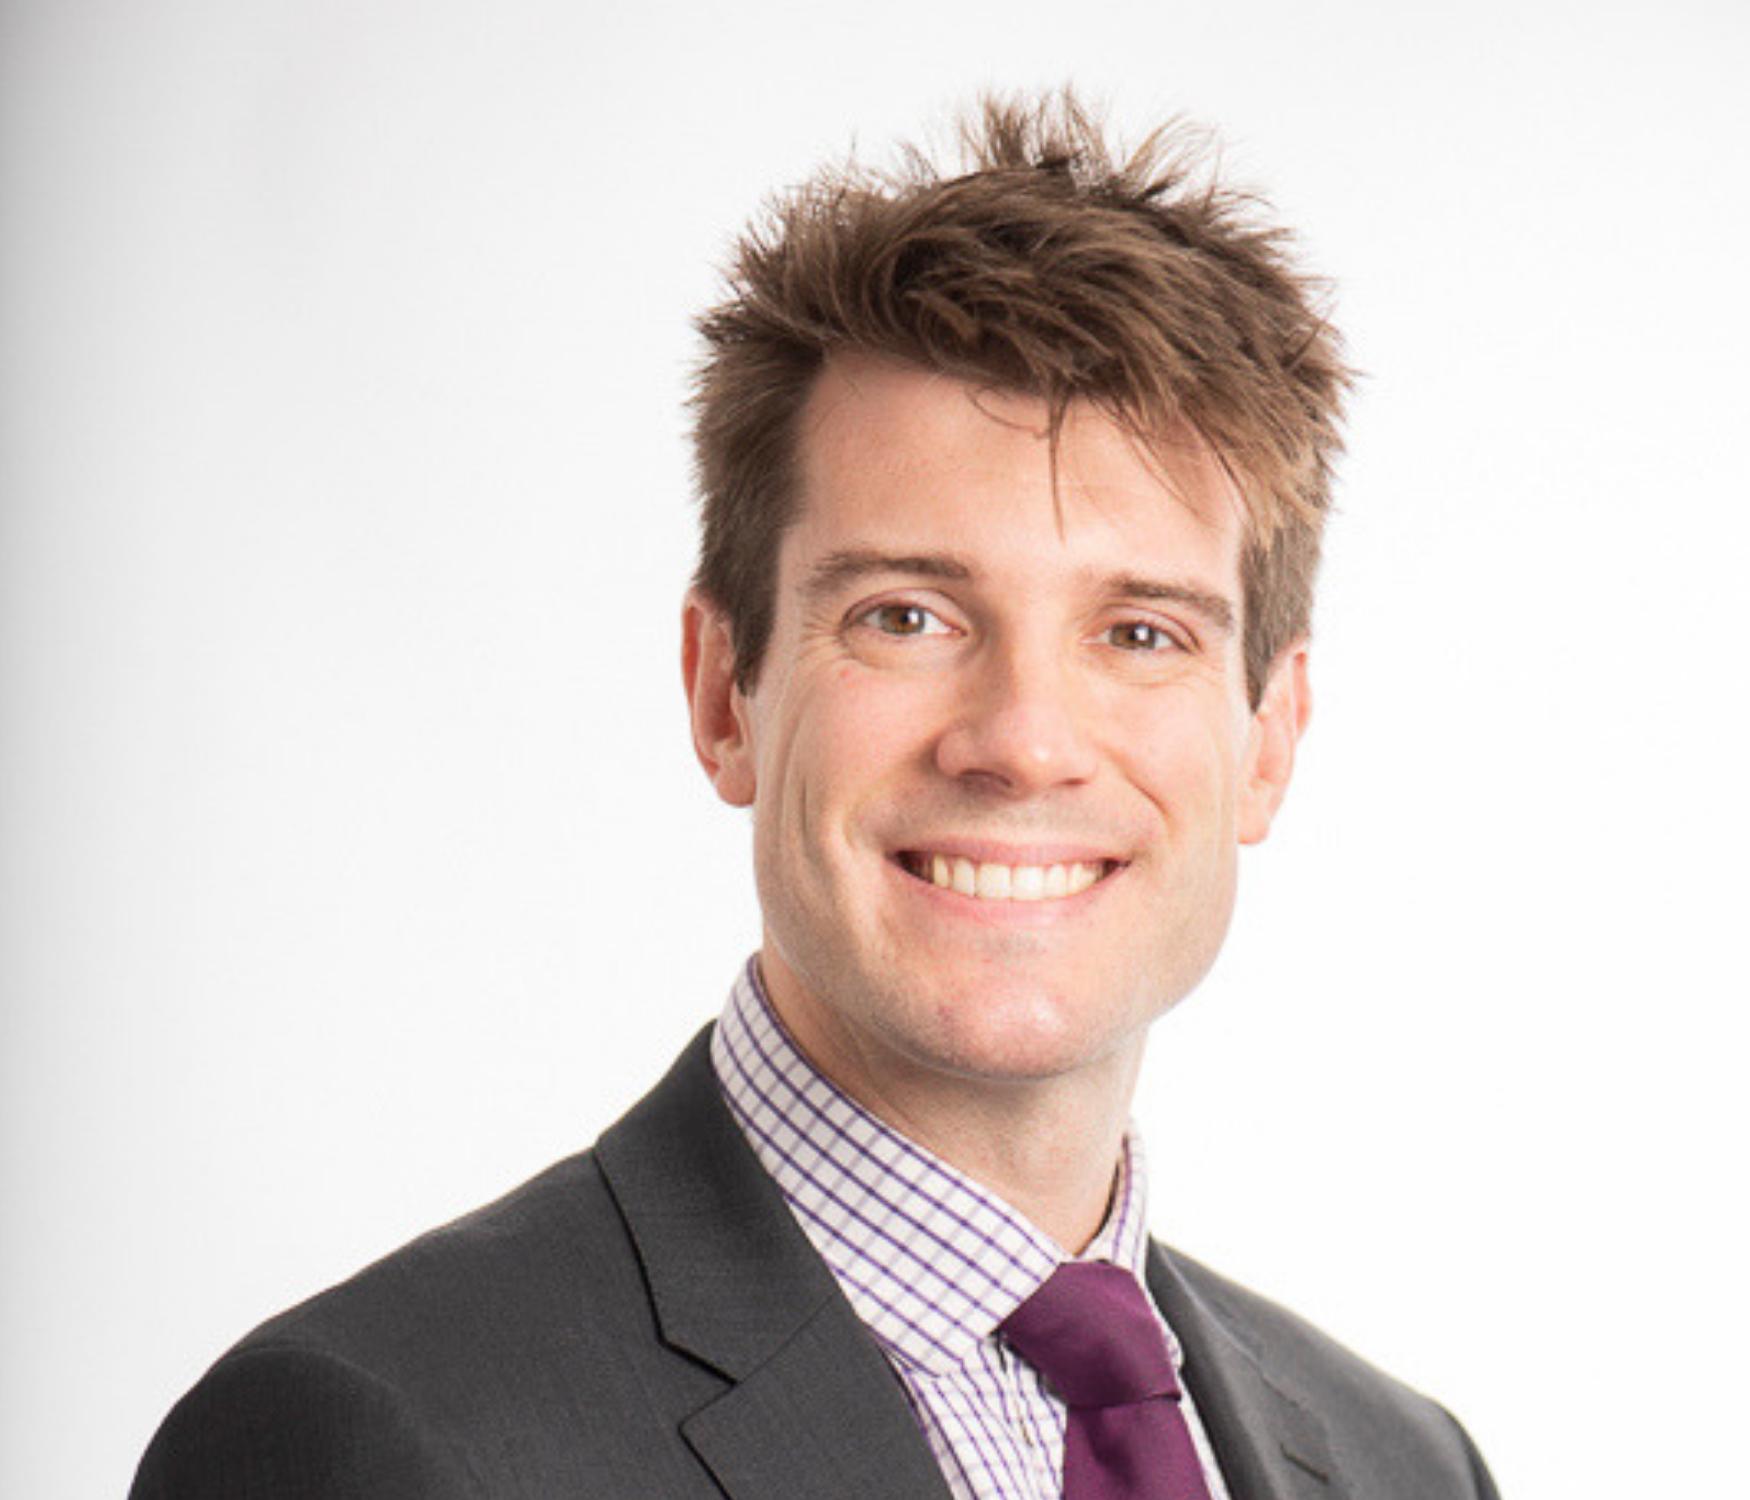 Owen Marsden becoming Associate Director